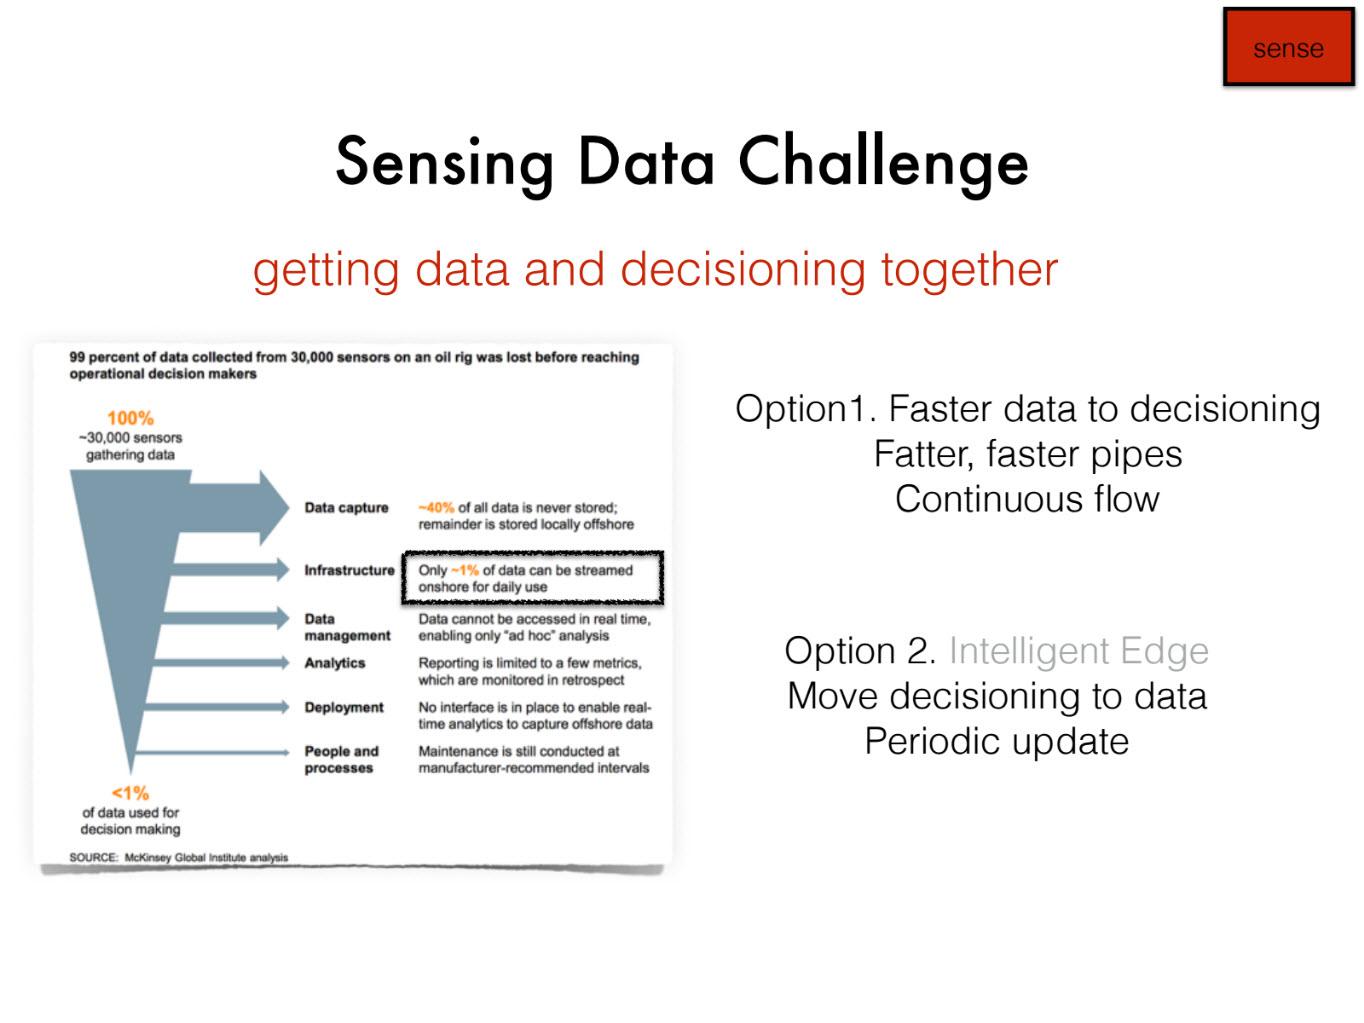 Venu Vasudevan IIoT Predix Predictive Analytics 3 sensing data challenge